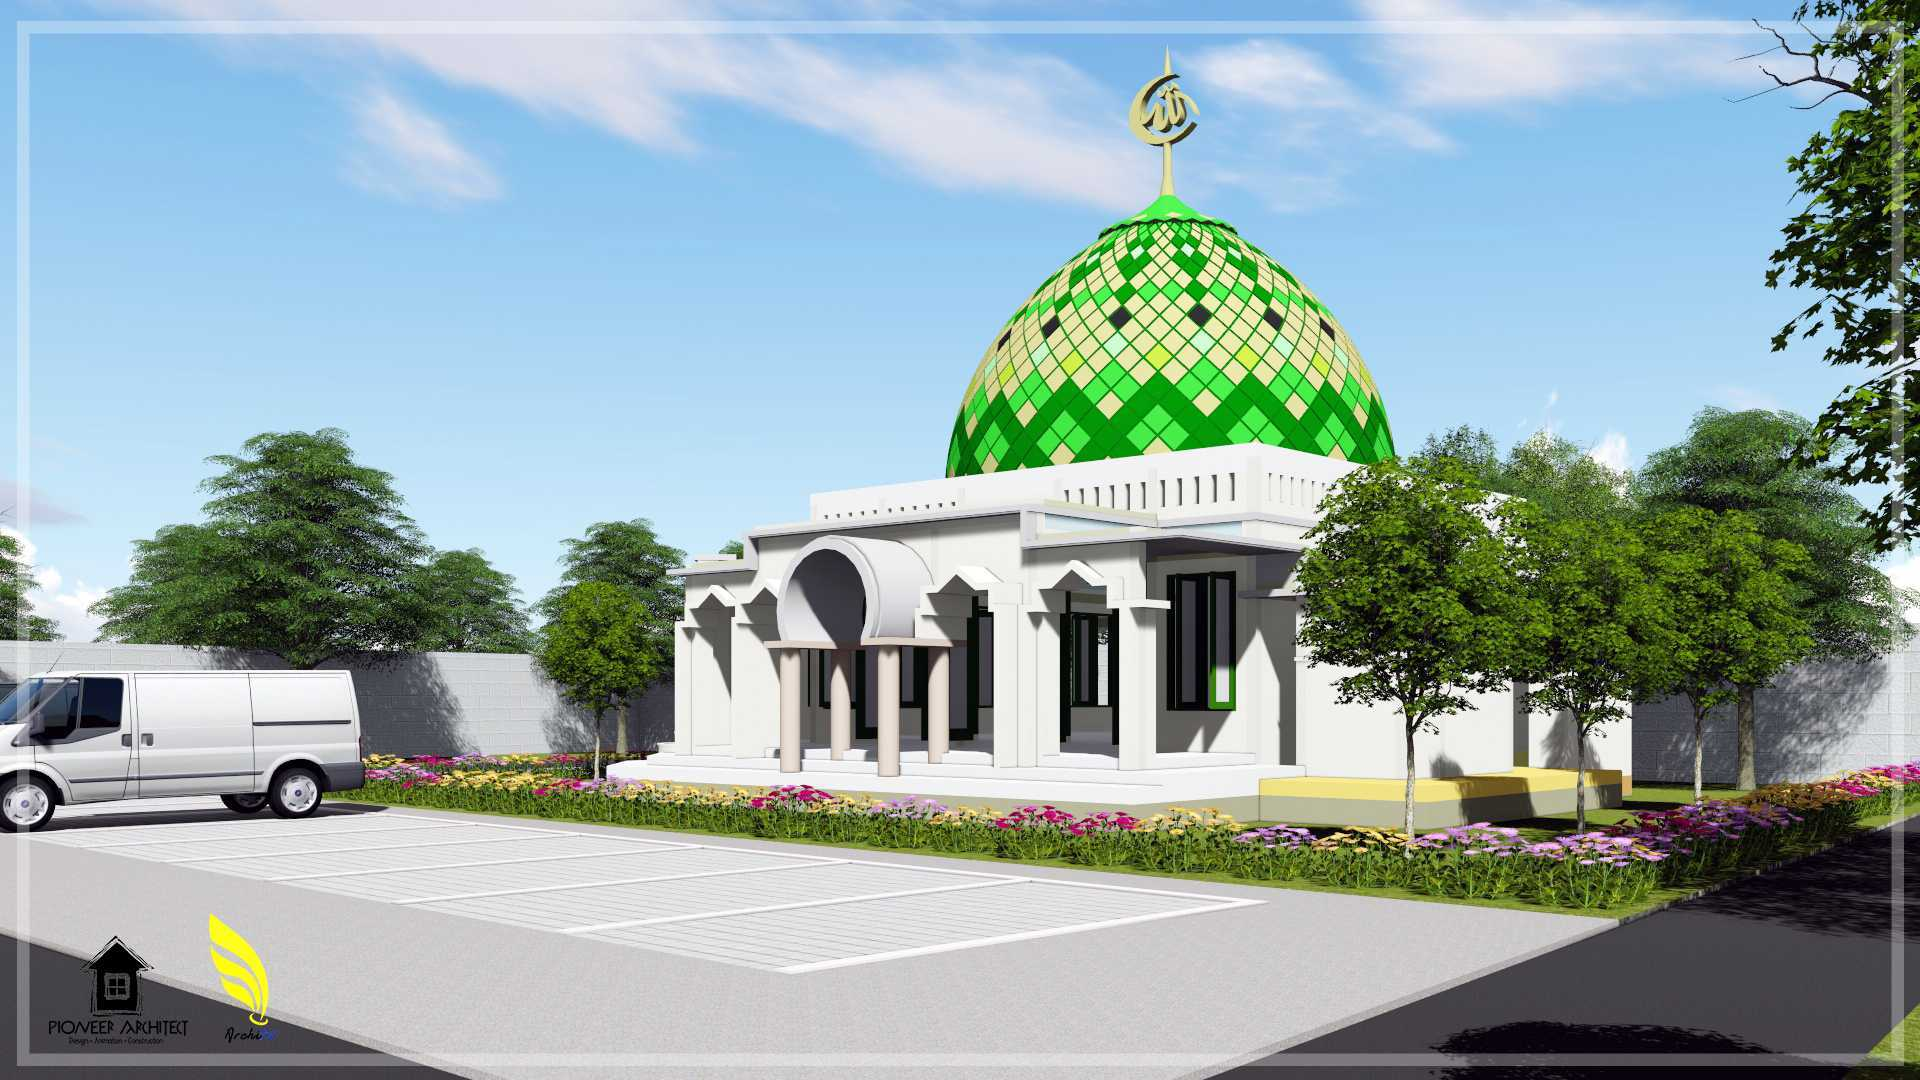 Pionner Architect Sekalah Terpadu Kabupaten Aceh Timur, Aceh, Indonesia Kabupaten Aceh Timur, Aceh, Indonesia Mosque Klasik  43409